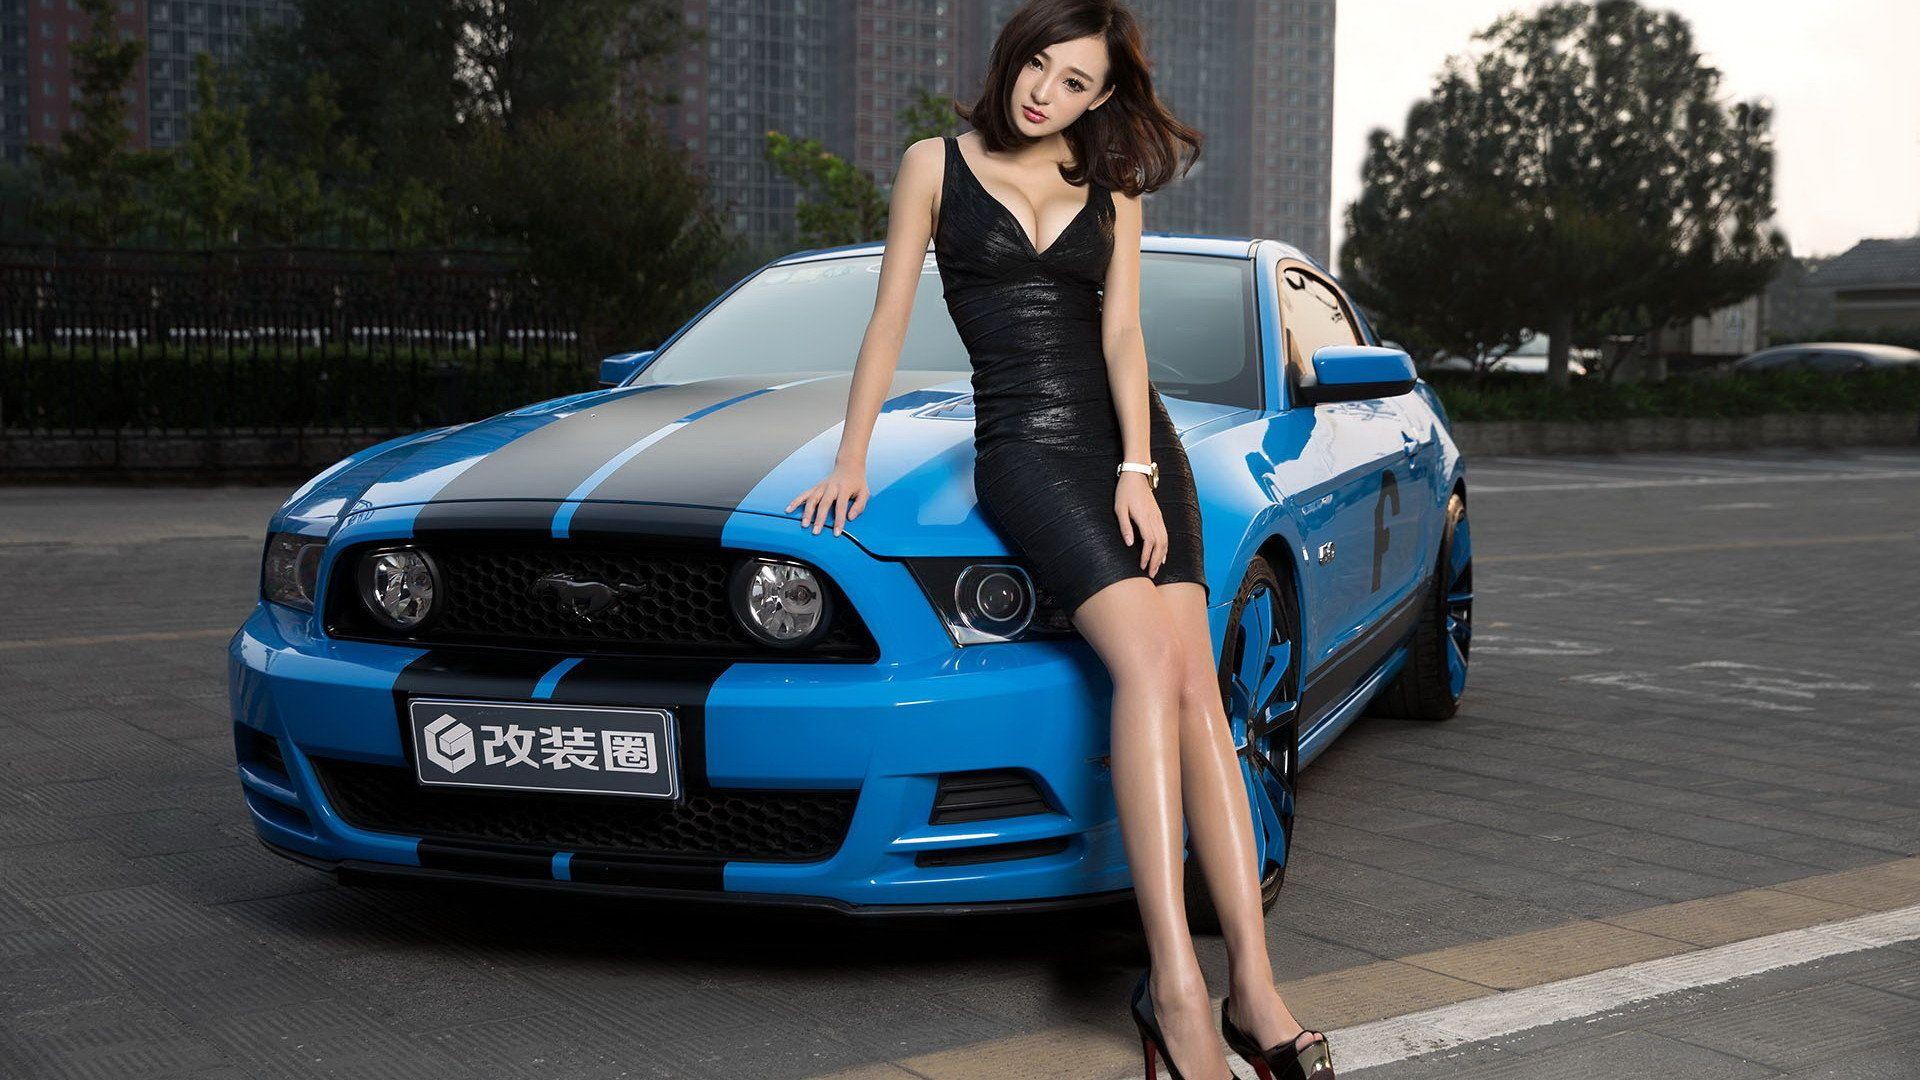 Car Girl wallpaper picture